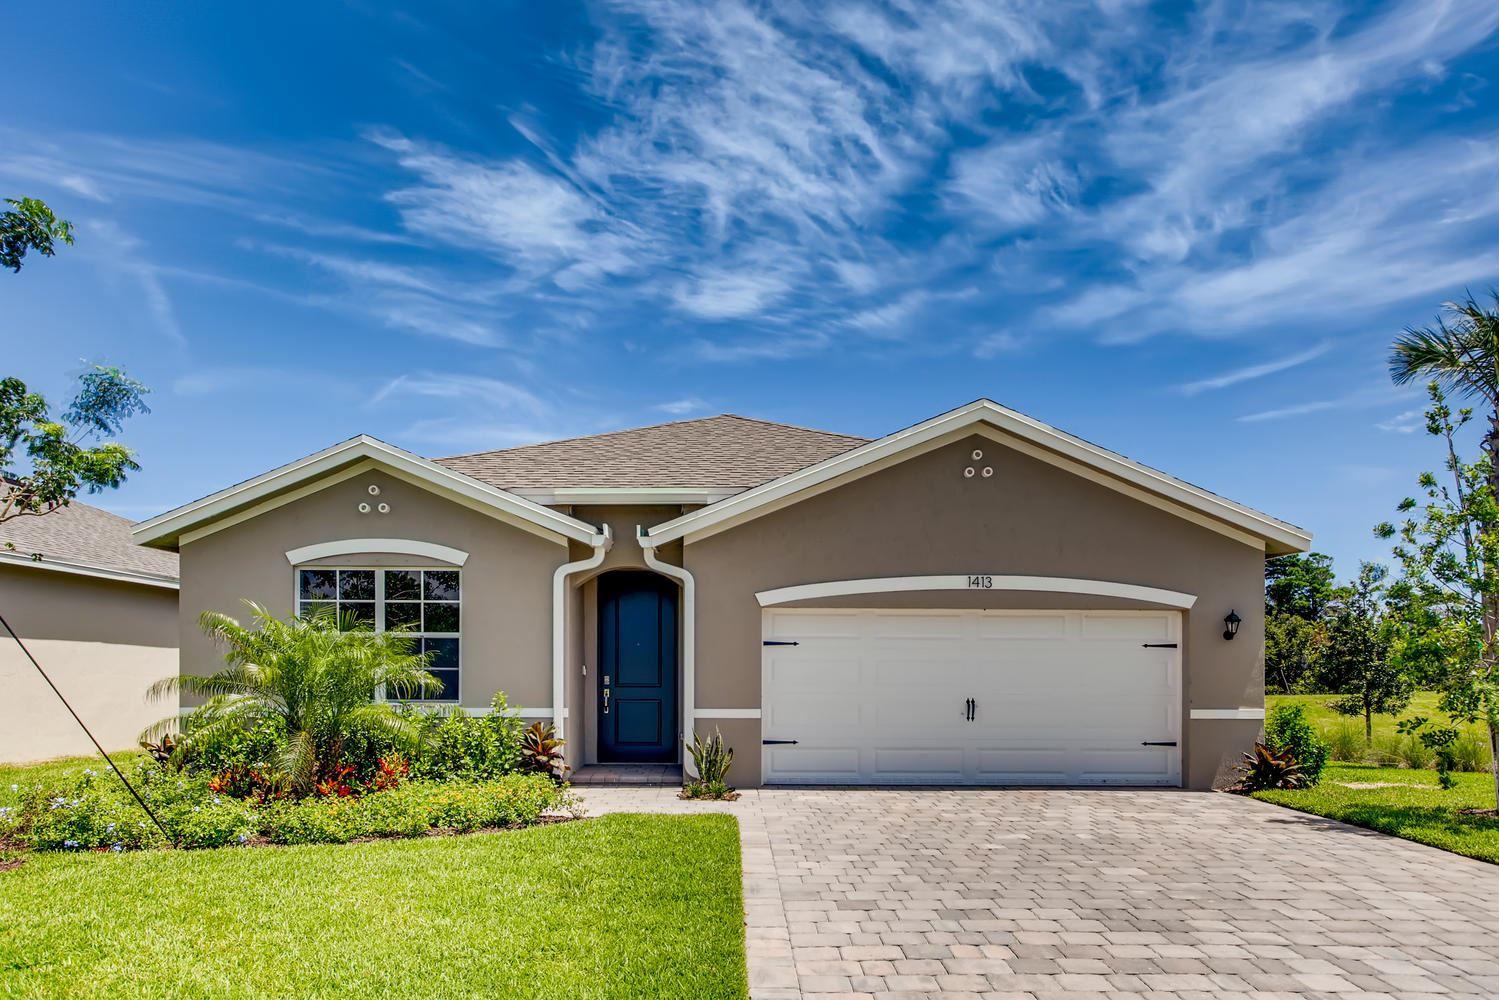 1413 NE White Pine Terrace, Jensen Beach, FL 34957 - #: RX-10639079